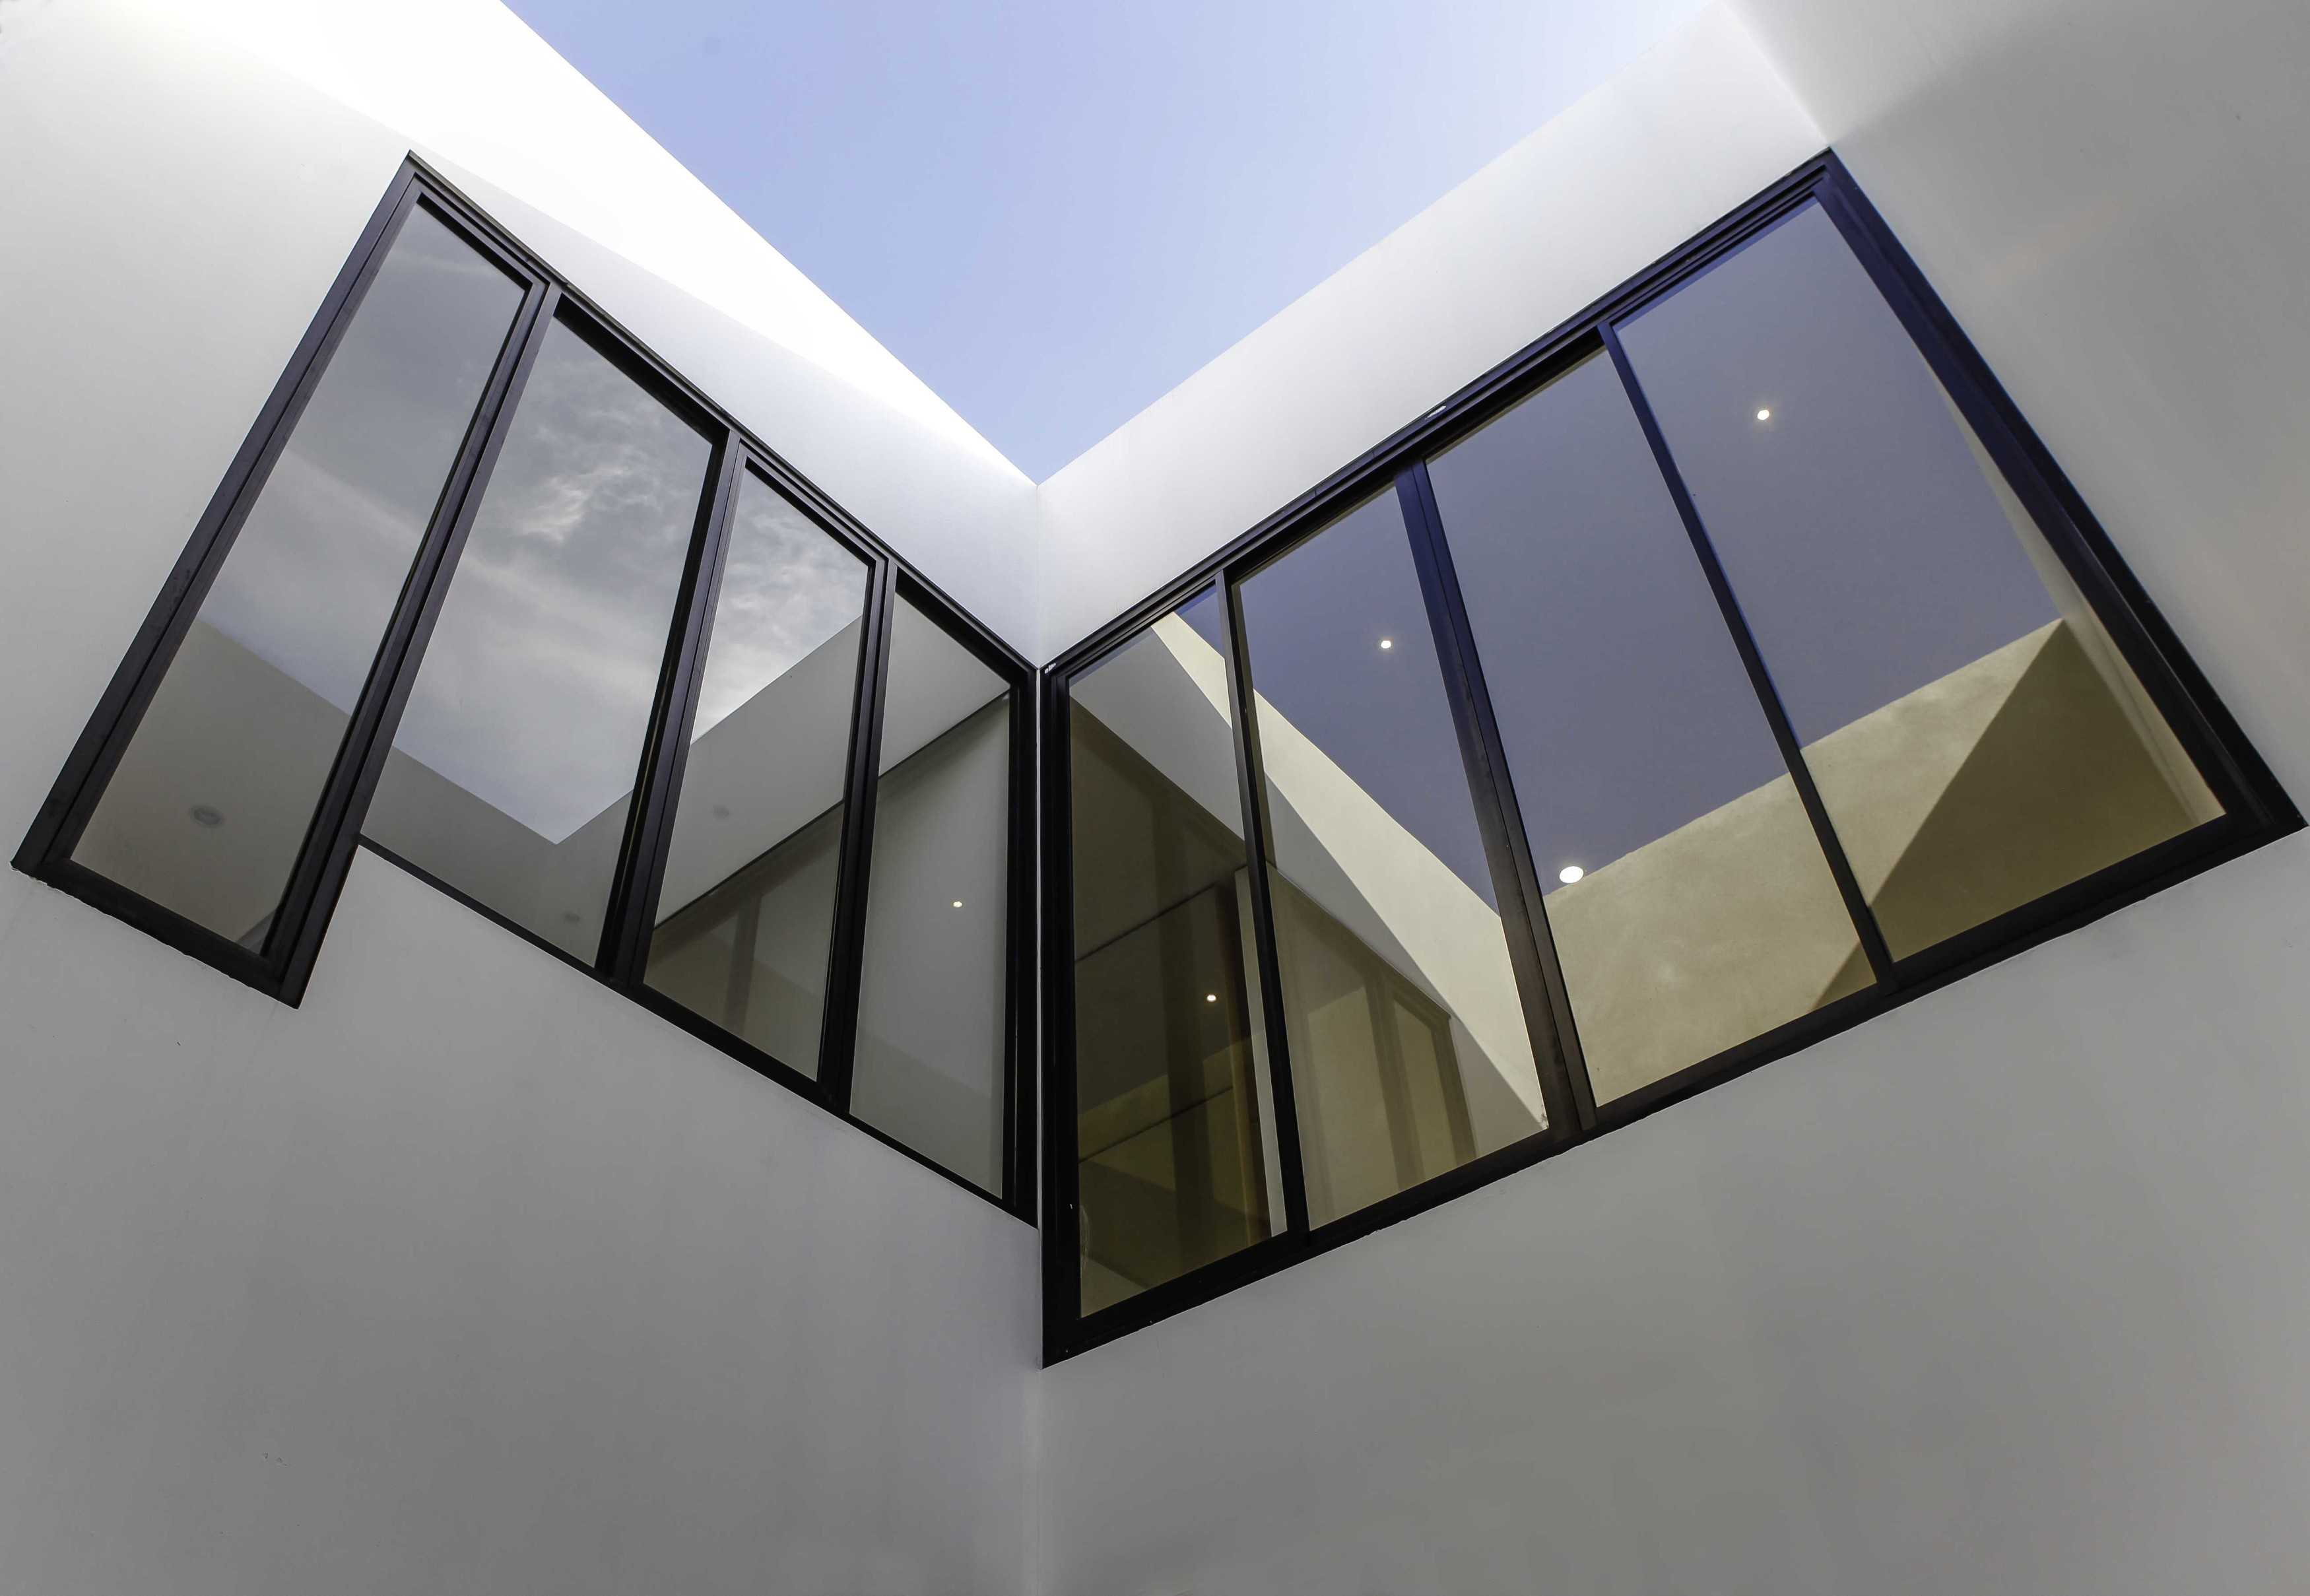 Design Intervention Ta House Jakarta, Daerah Khusus Ibukota Jakarta, Indonesia Jakarta, Daerah Khusus Ibukota Jakarta, Indonesia Design-Intervention-Ta-House   71093